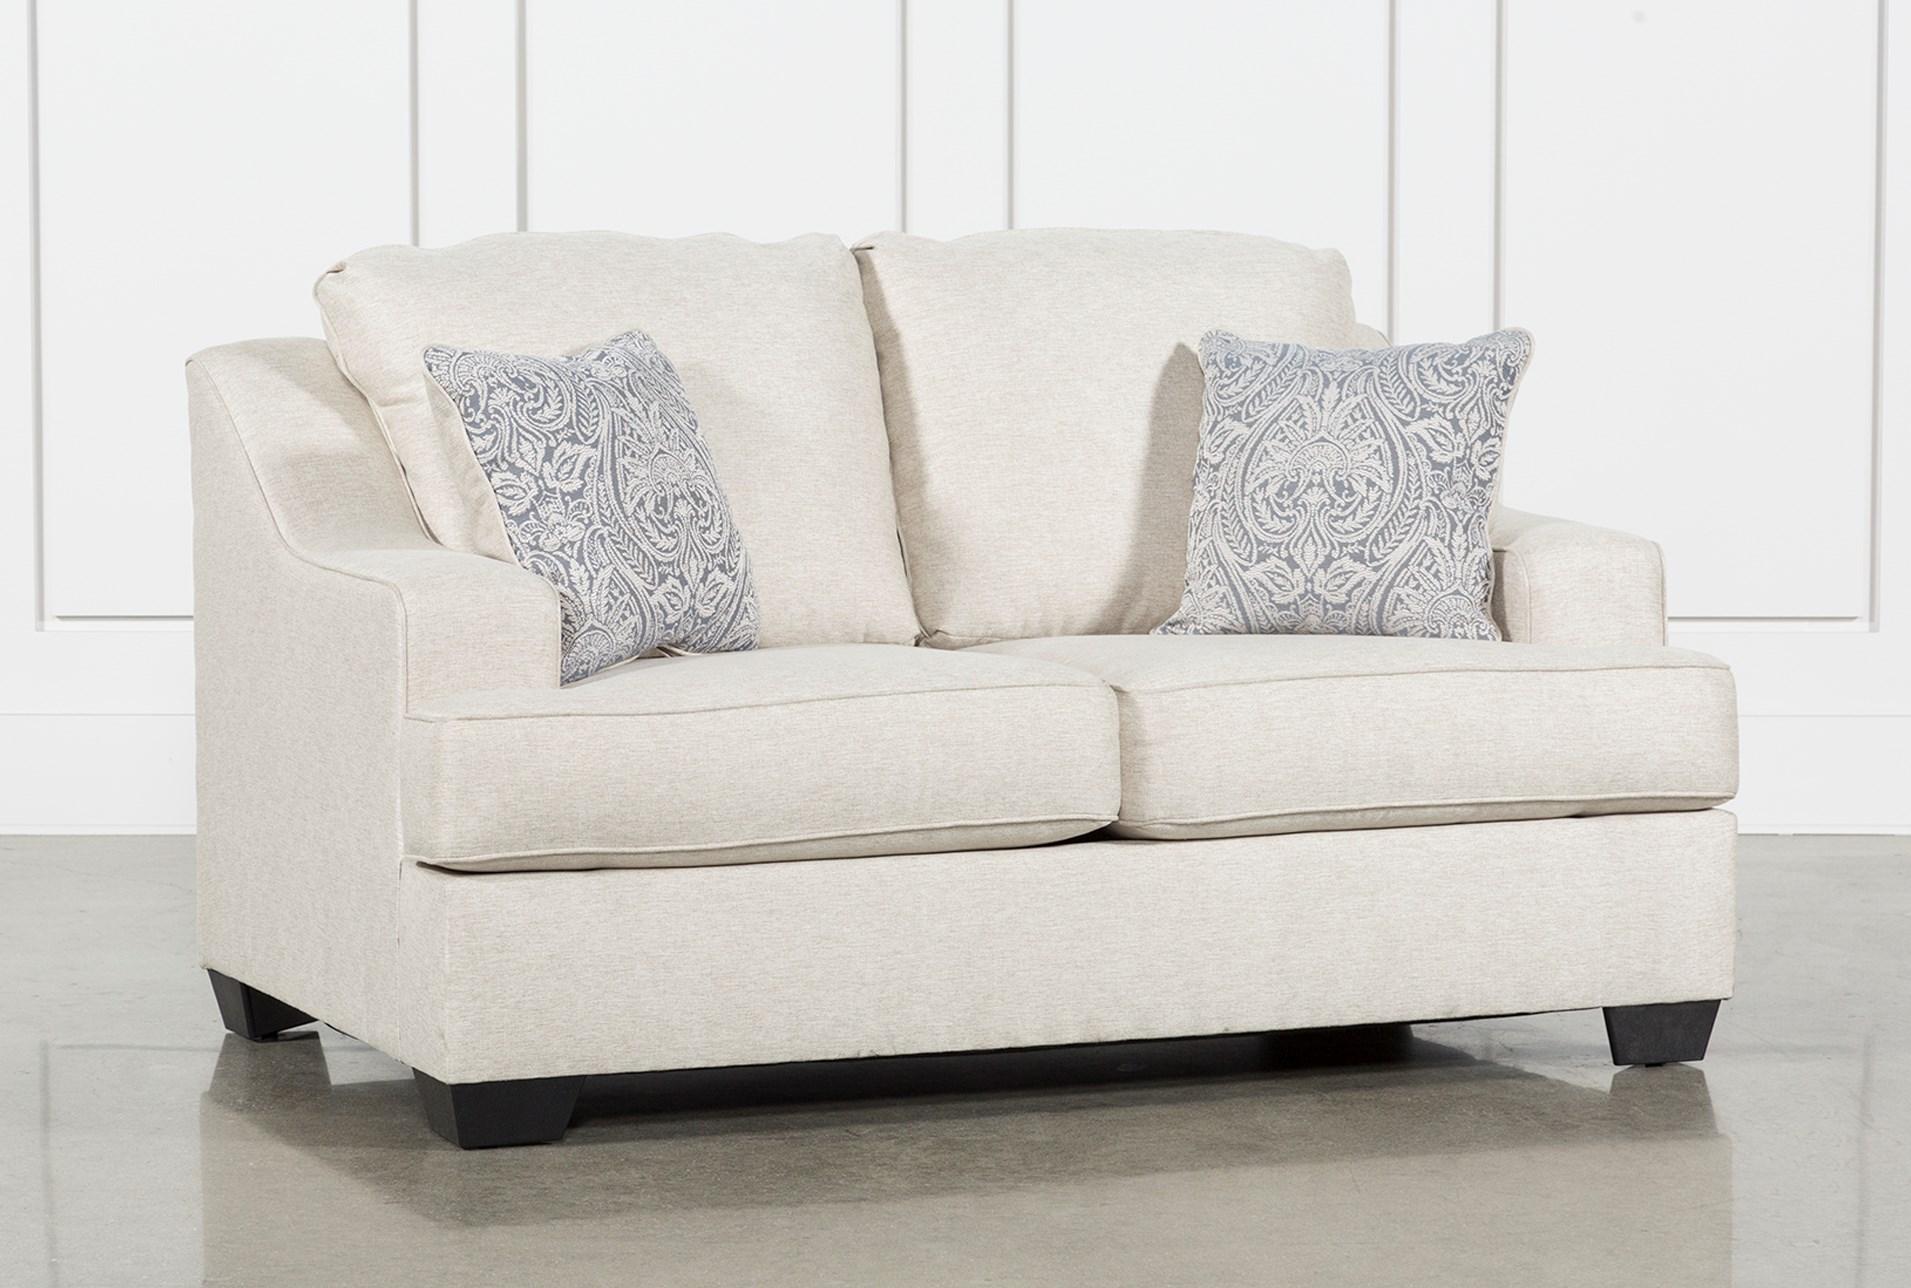 fabric target mid astrid fmt loveseat wid baxton gray a century p studio hei